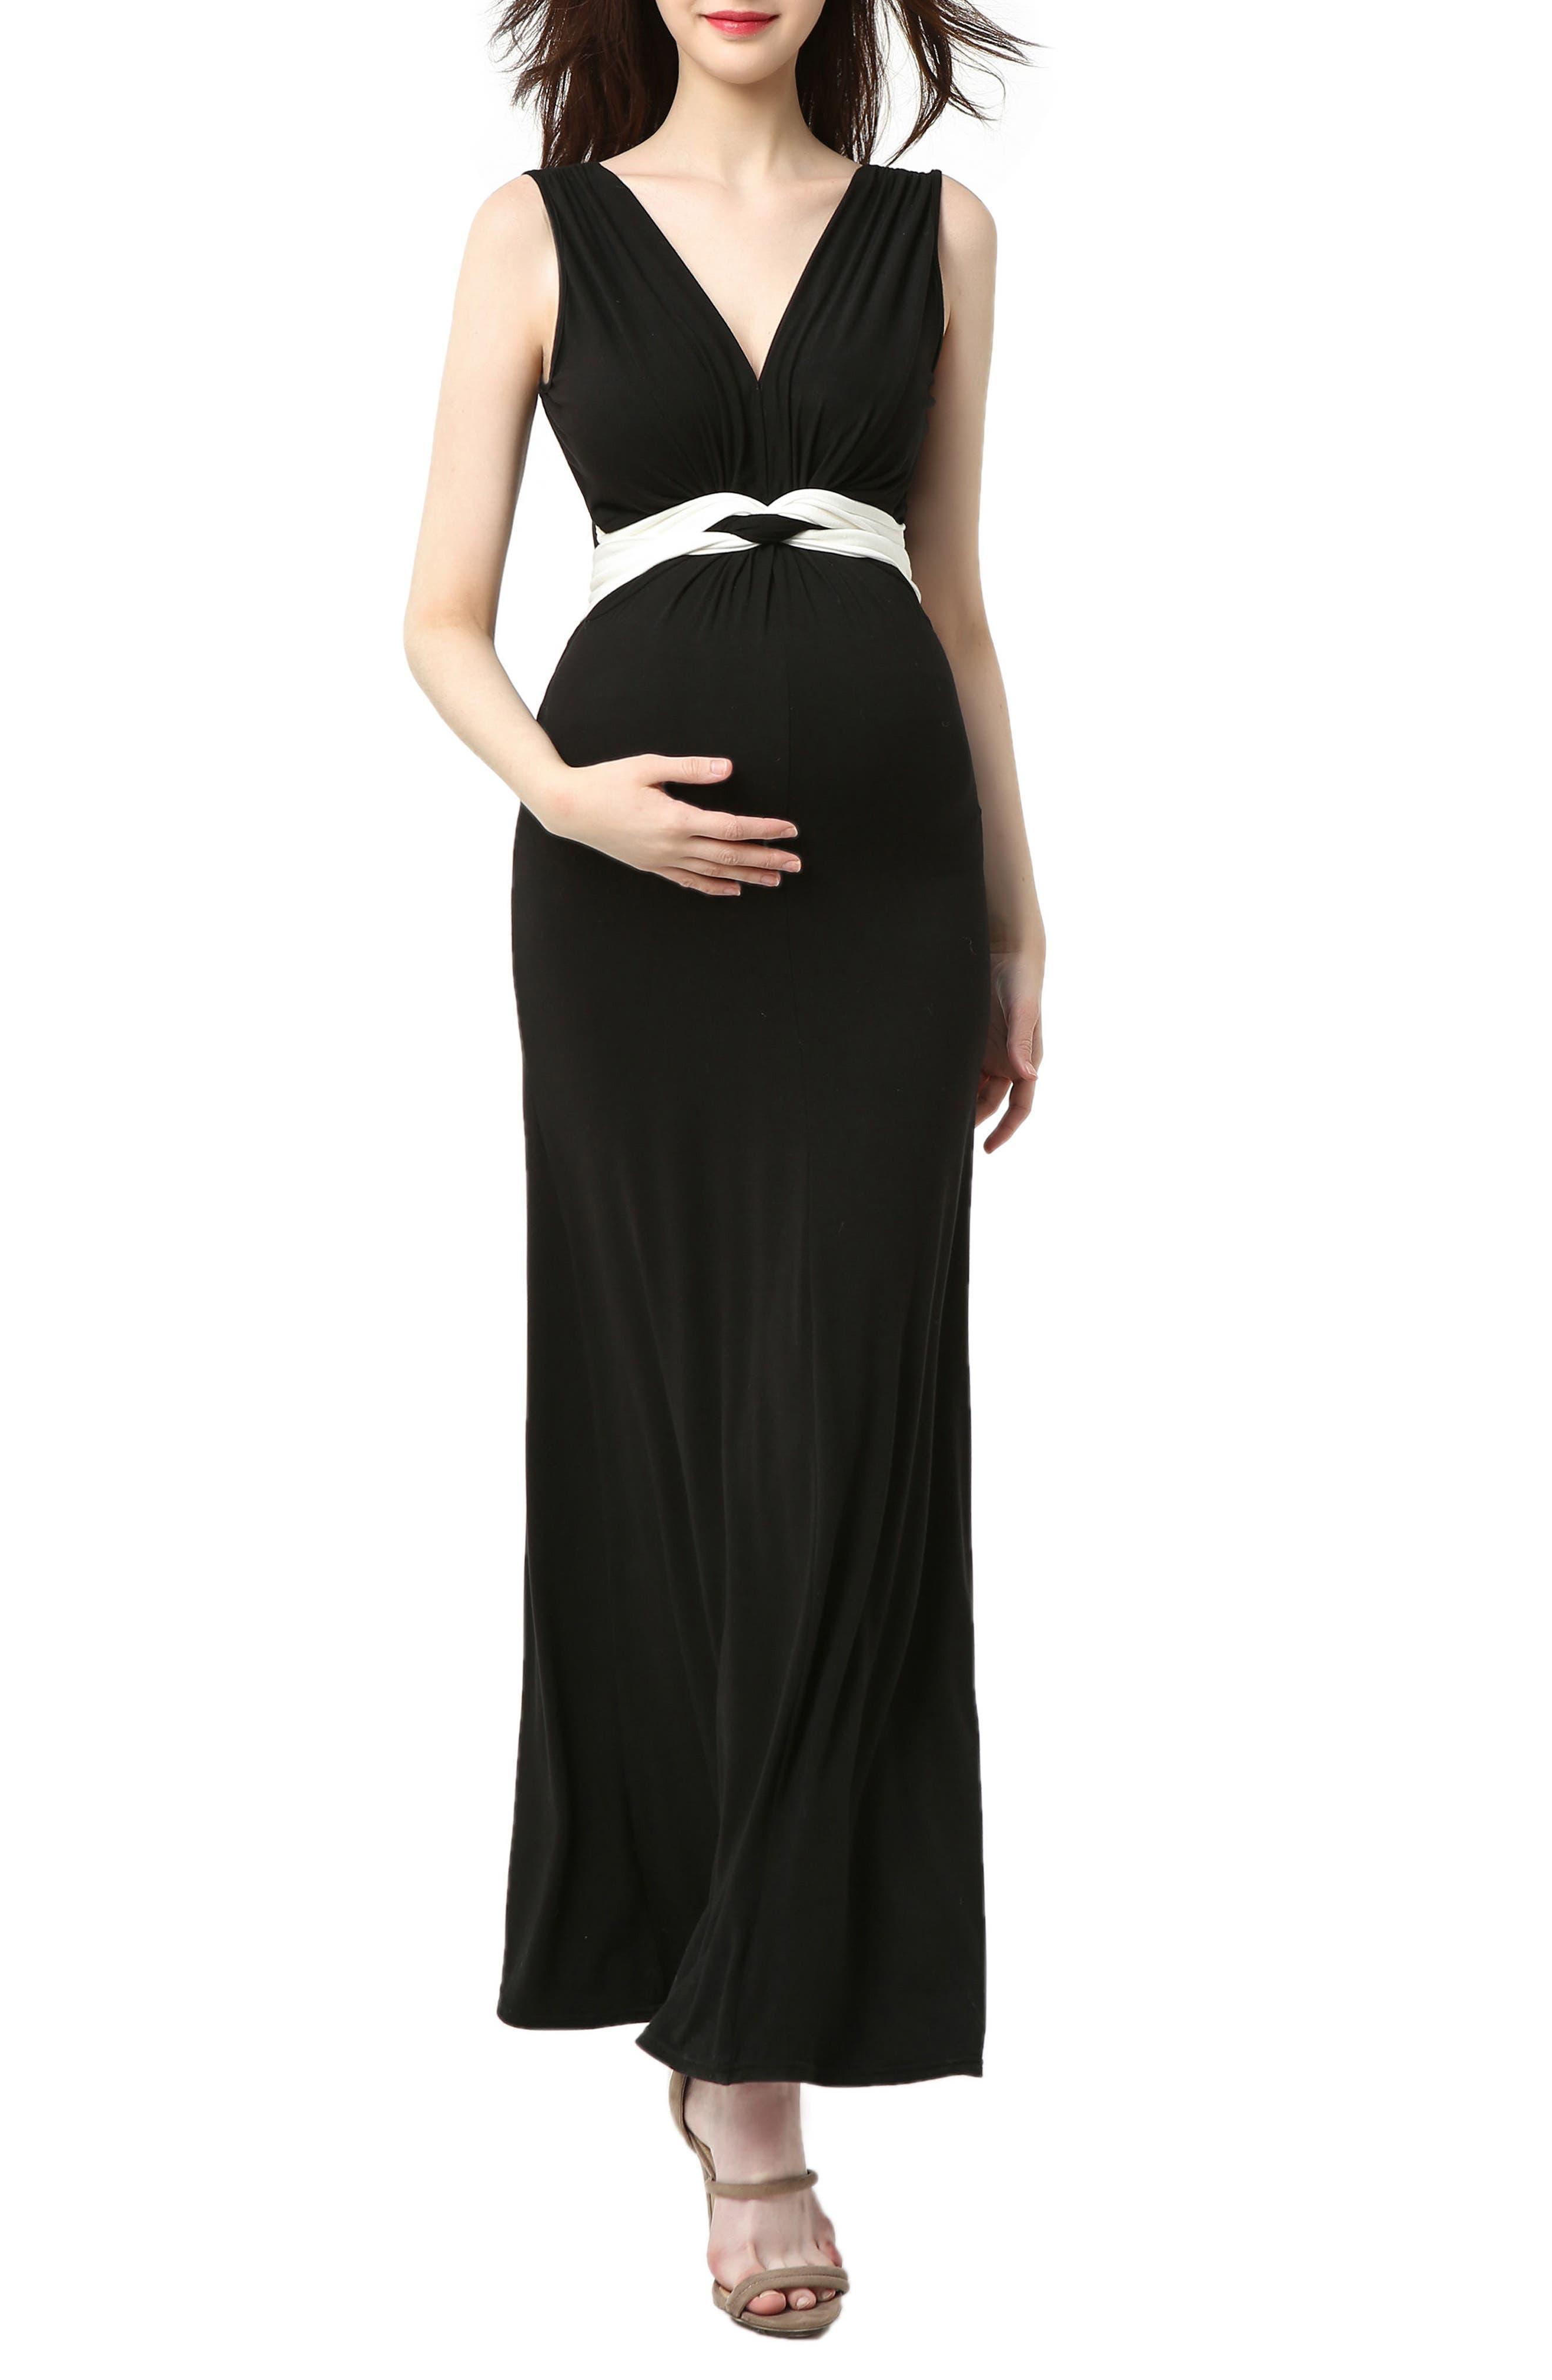 Scarlett Maternity Maxi Dress,                         Main,                         color, BLACK/ WHITE